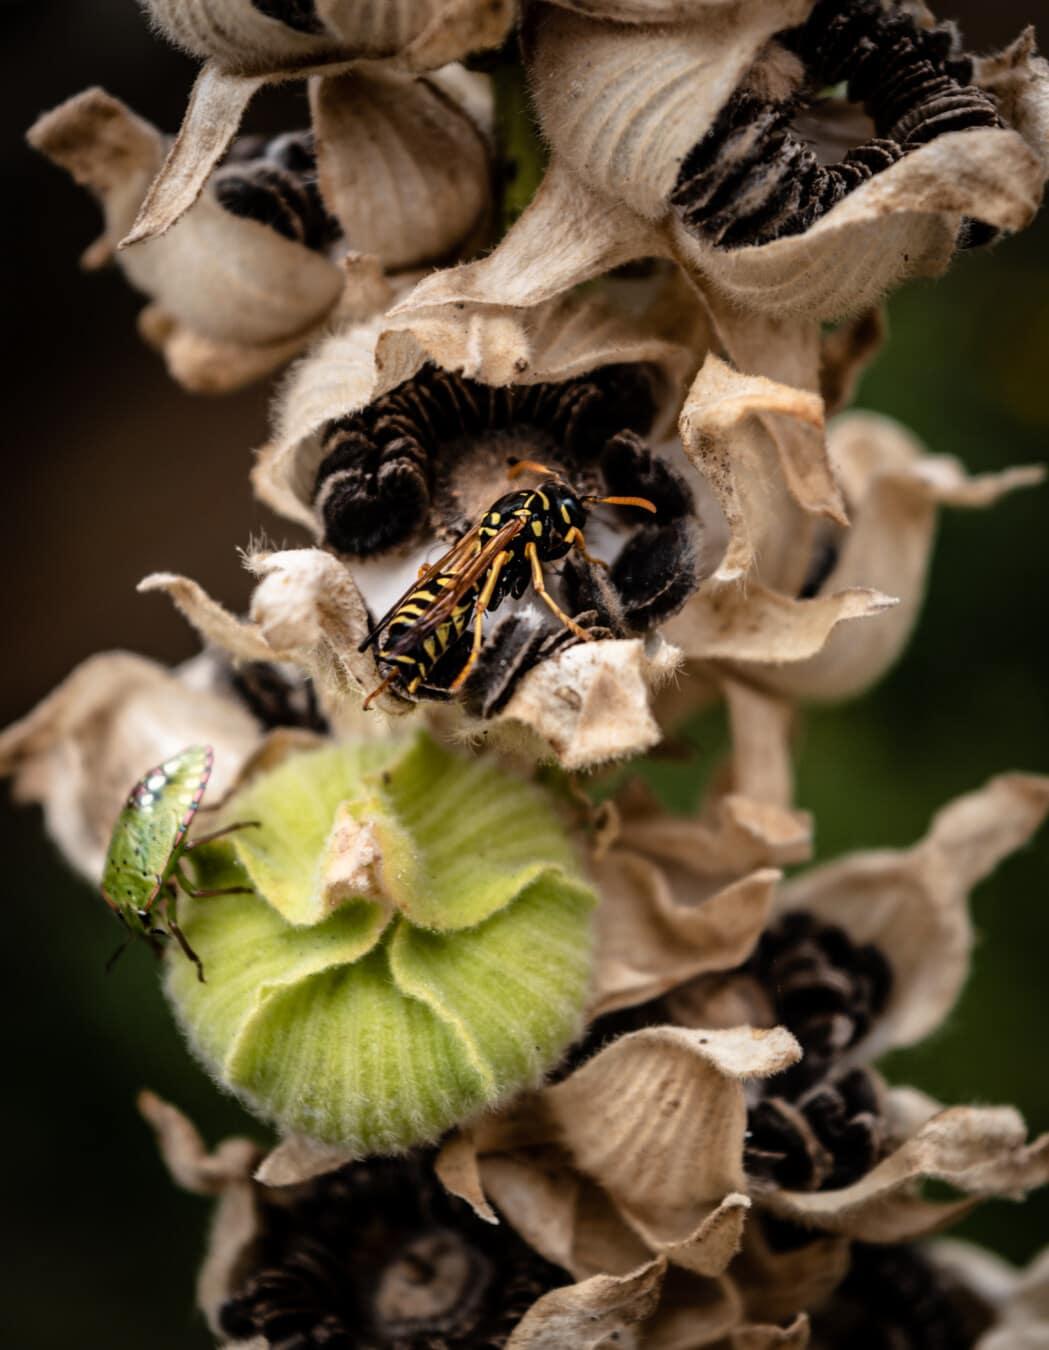 guêpe, insecte, vert, Beetle, semences, fleur, fermer, nature, pollen, herbe